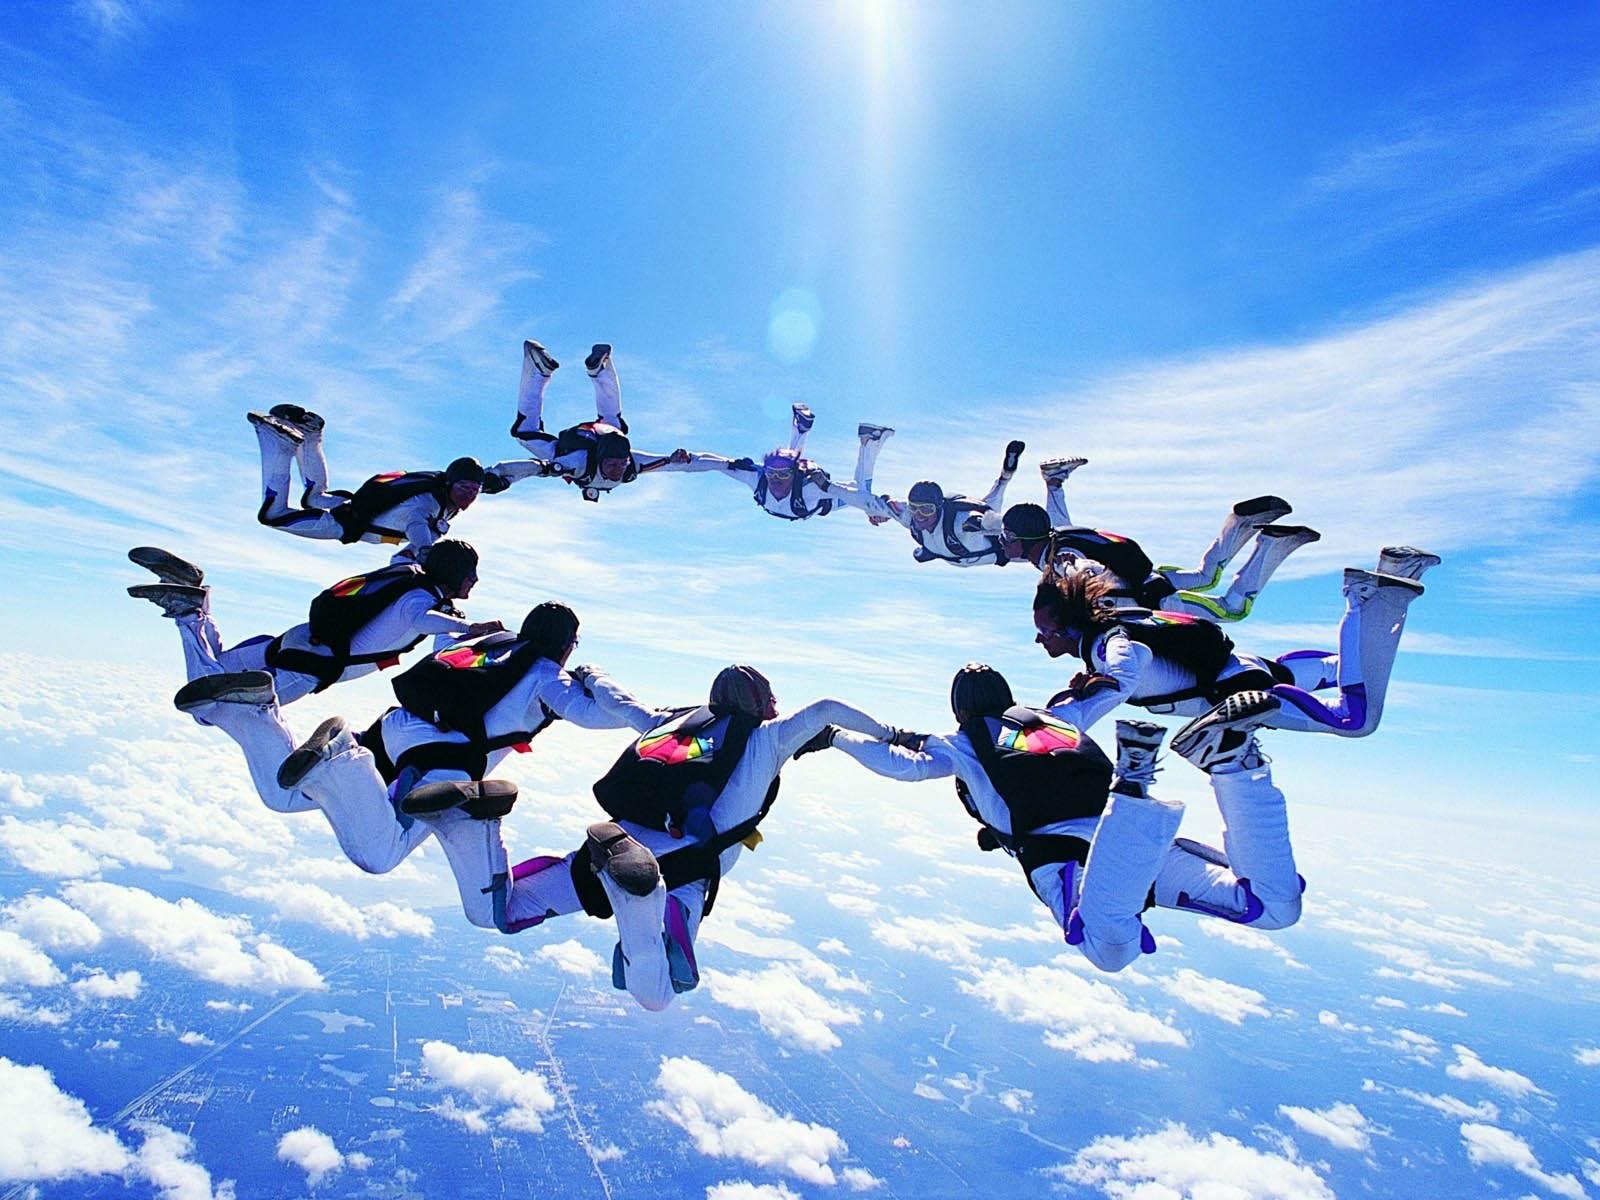 http://3.bp.blogspot.com/-eRdf7tM8Tsw/UD5K24GVzLI/AAAAAAAAIkM/Ze2bsf1FlB0/s1600/Skydiving+Wallpapers+1.jpg